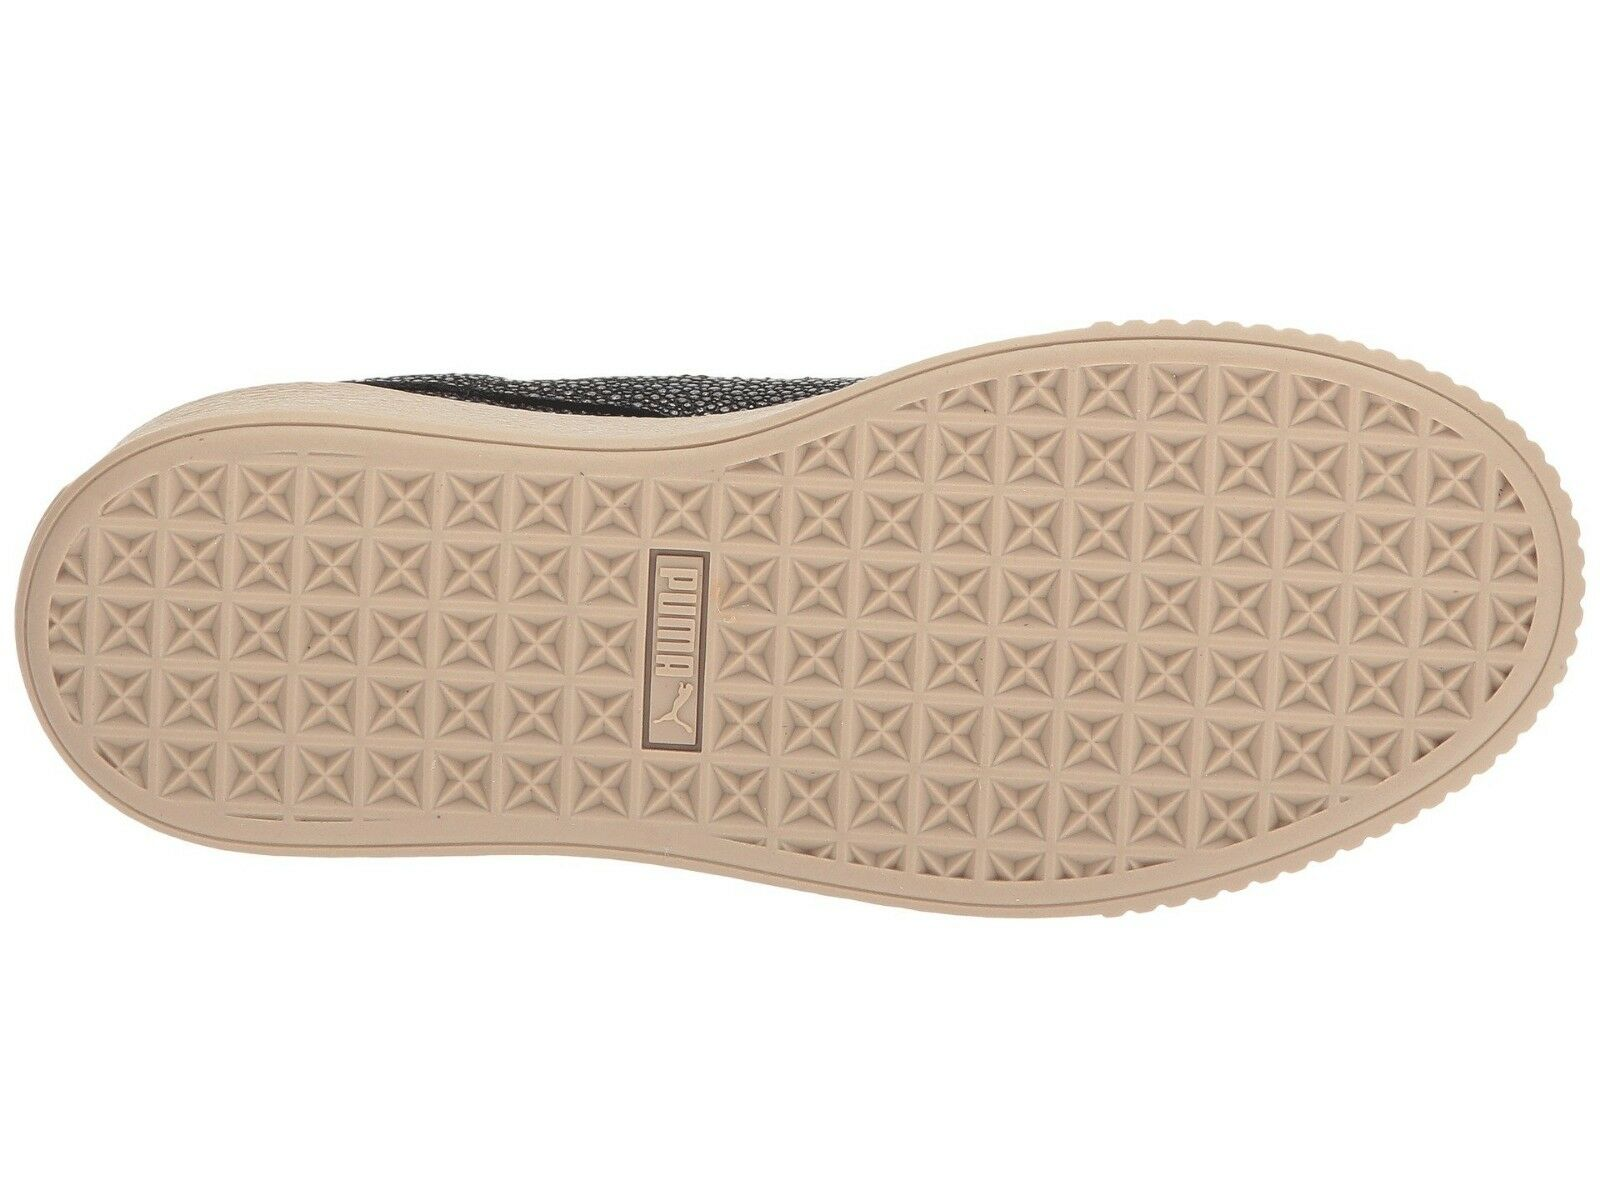 PUMA Women's Platform Lux Wn Wn Wn Sneaker color Puma Black Size US 8 763234